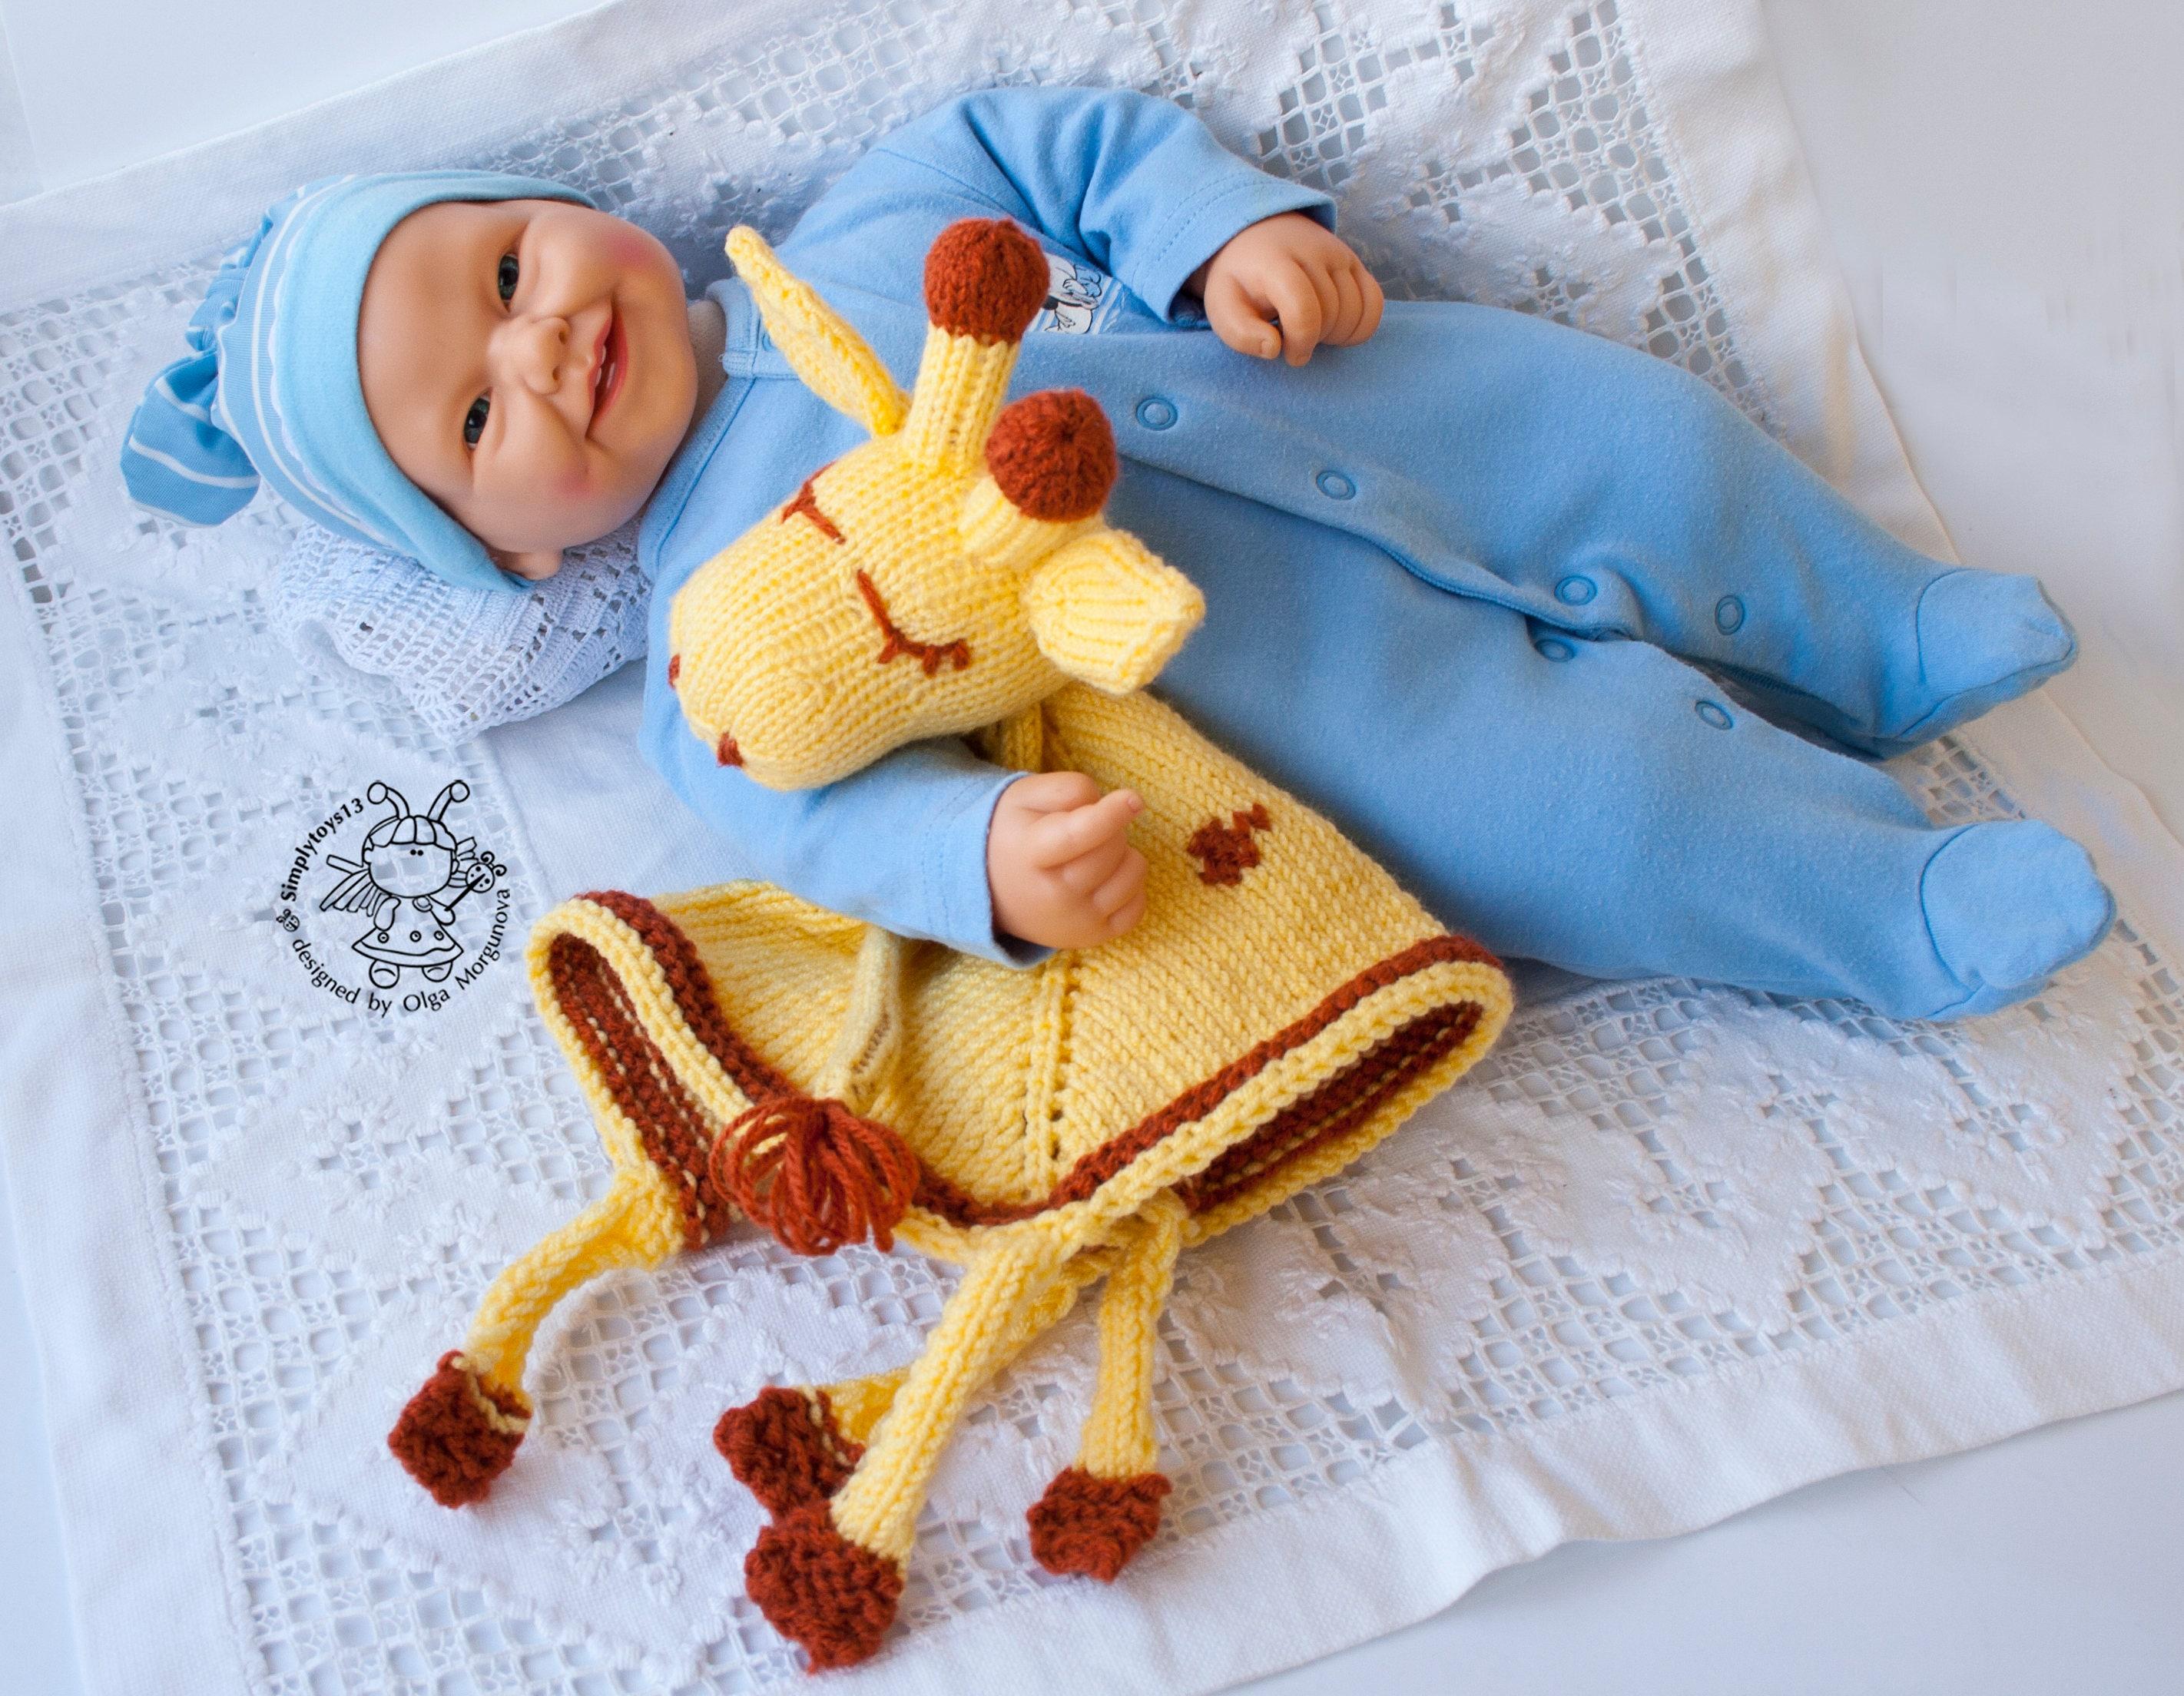 Giraffe Baby Blanket Knitting Pattern : Giraffe Toy Baby Blanket. Amigurumi Giraffe. Knitting Baby Blanket. GiraffeTo...